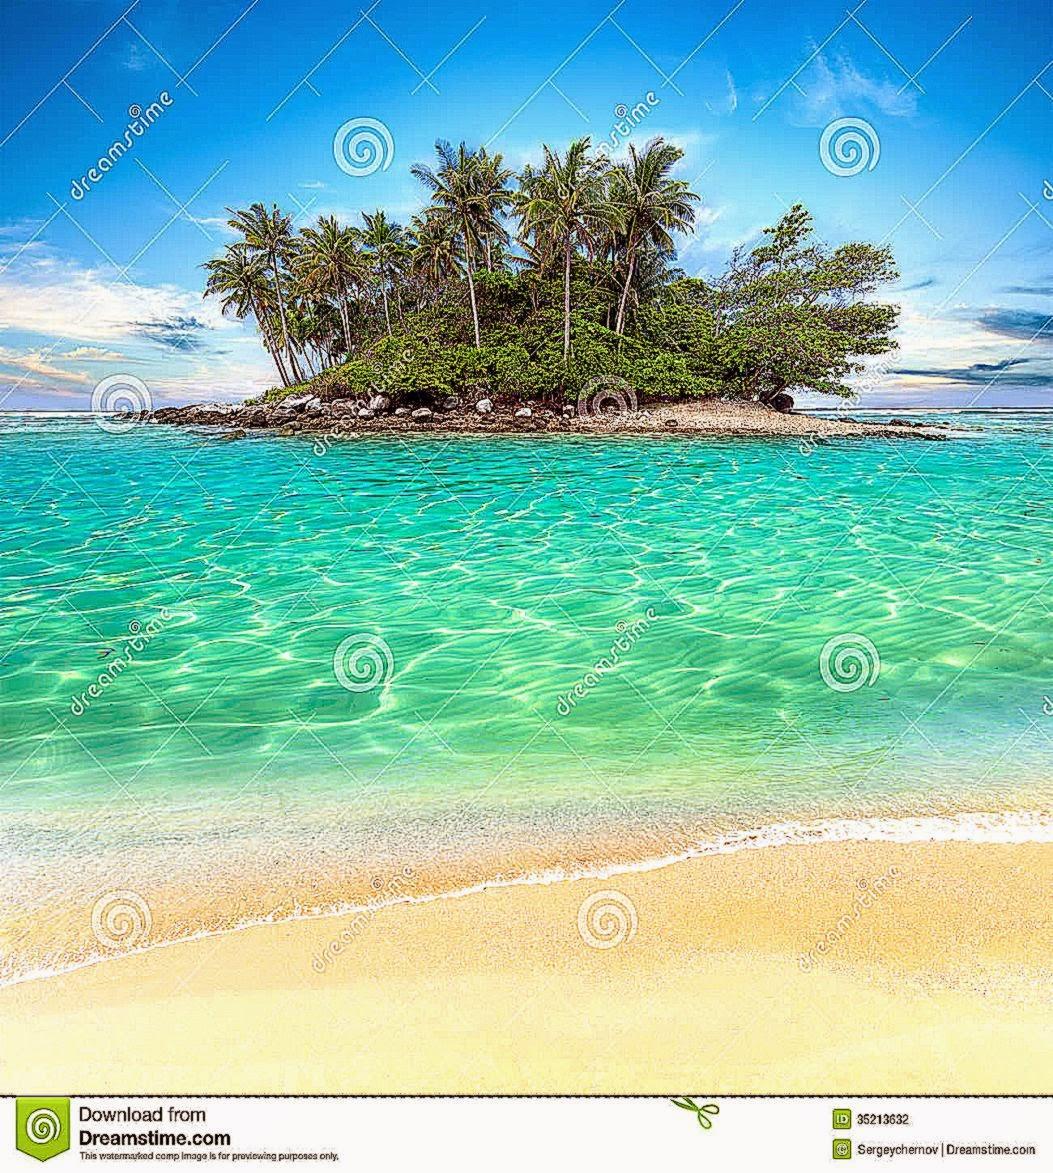 Tropical Island: Best Free HD Wallpaper